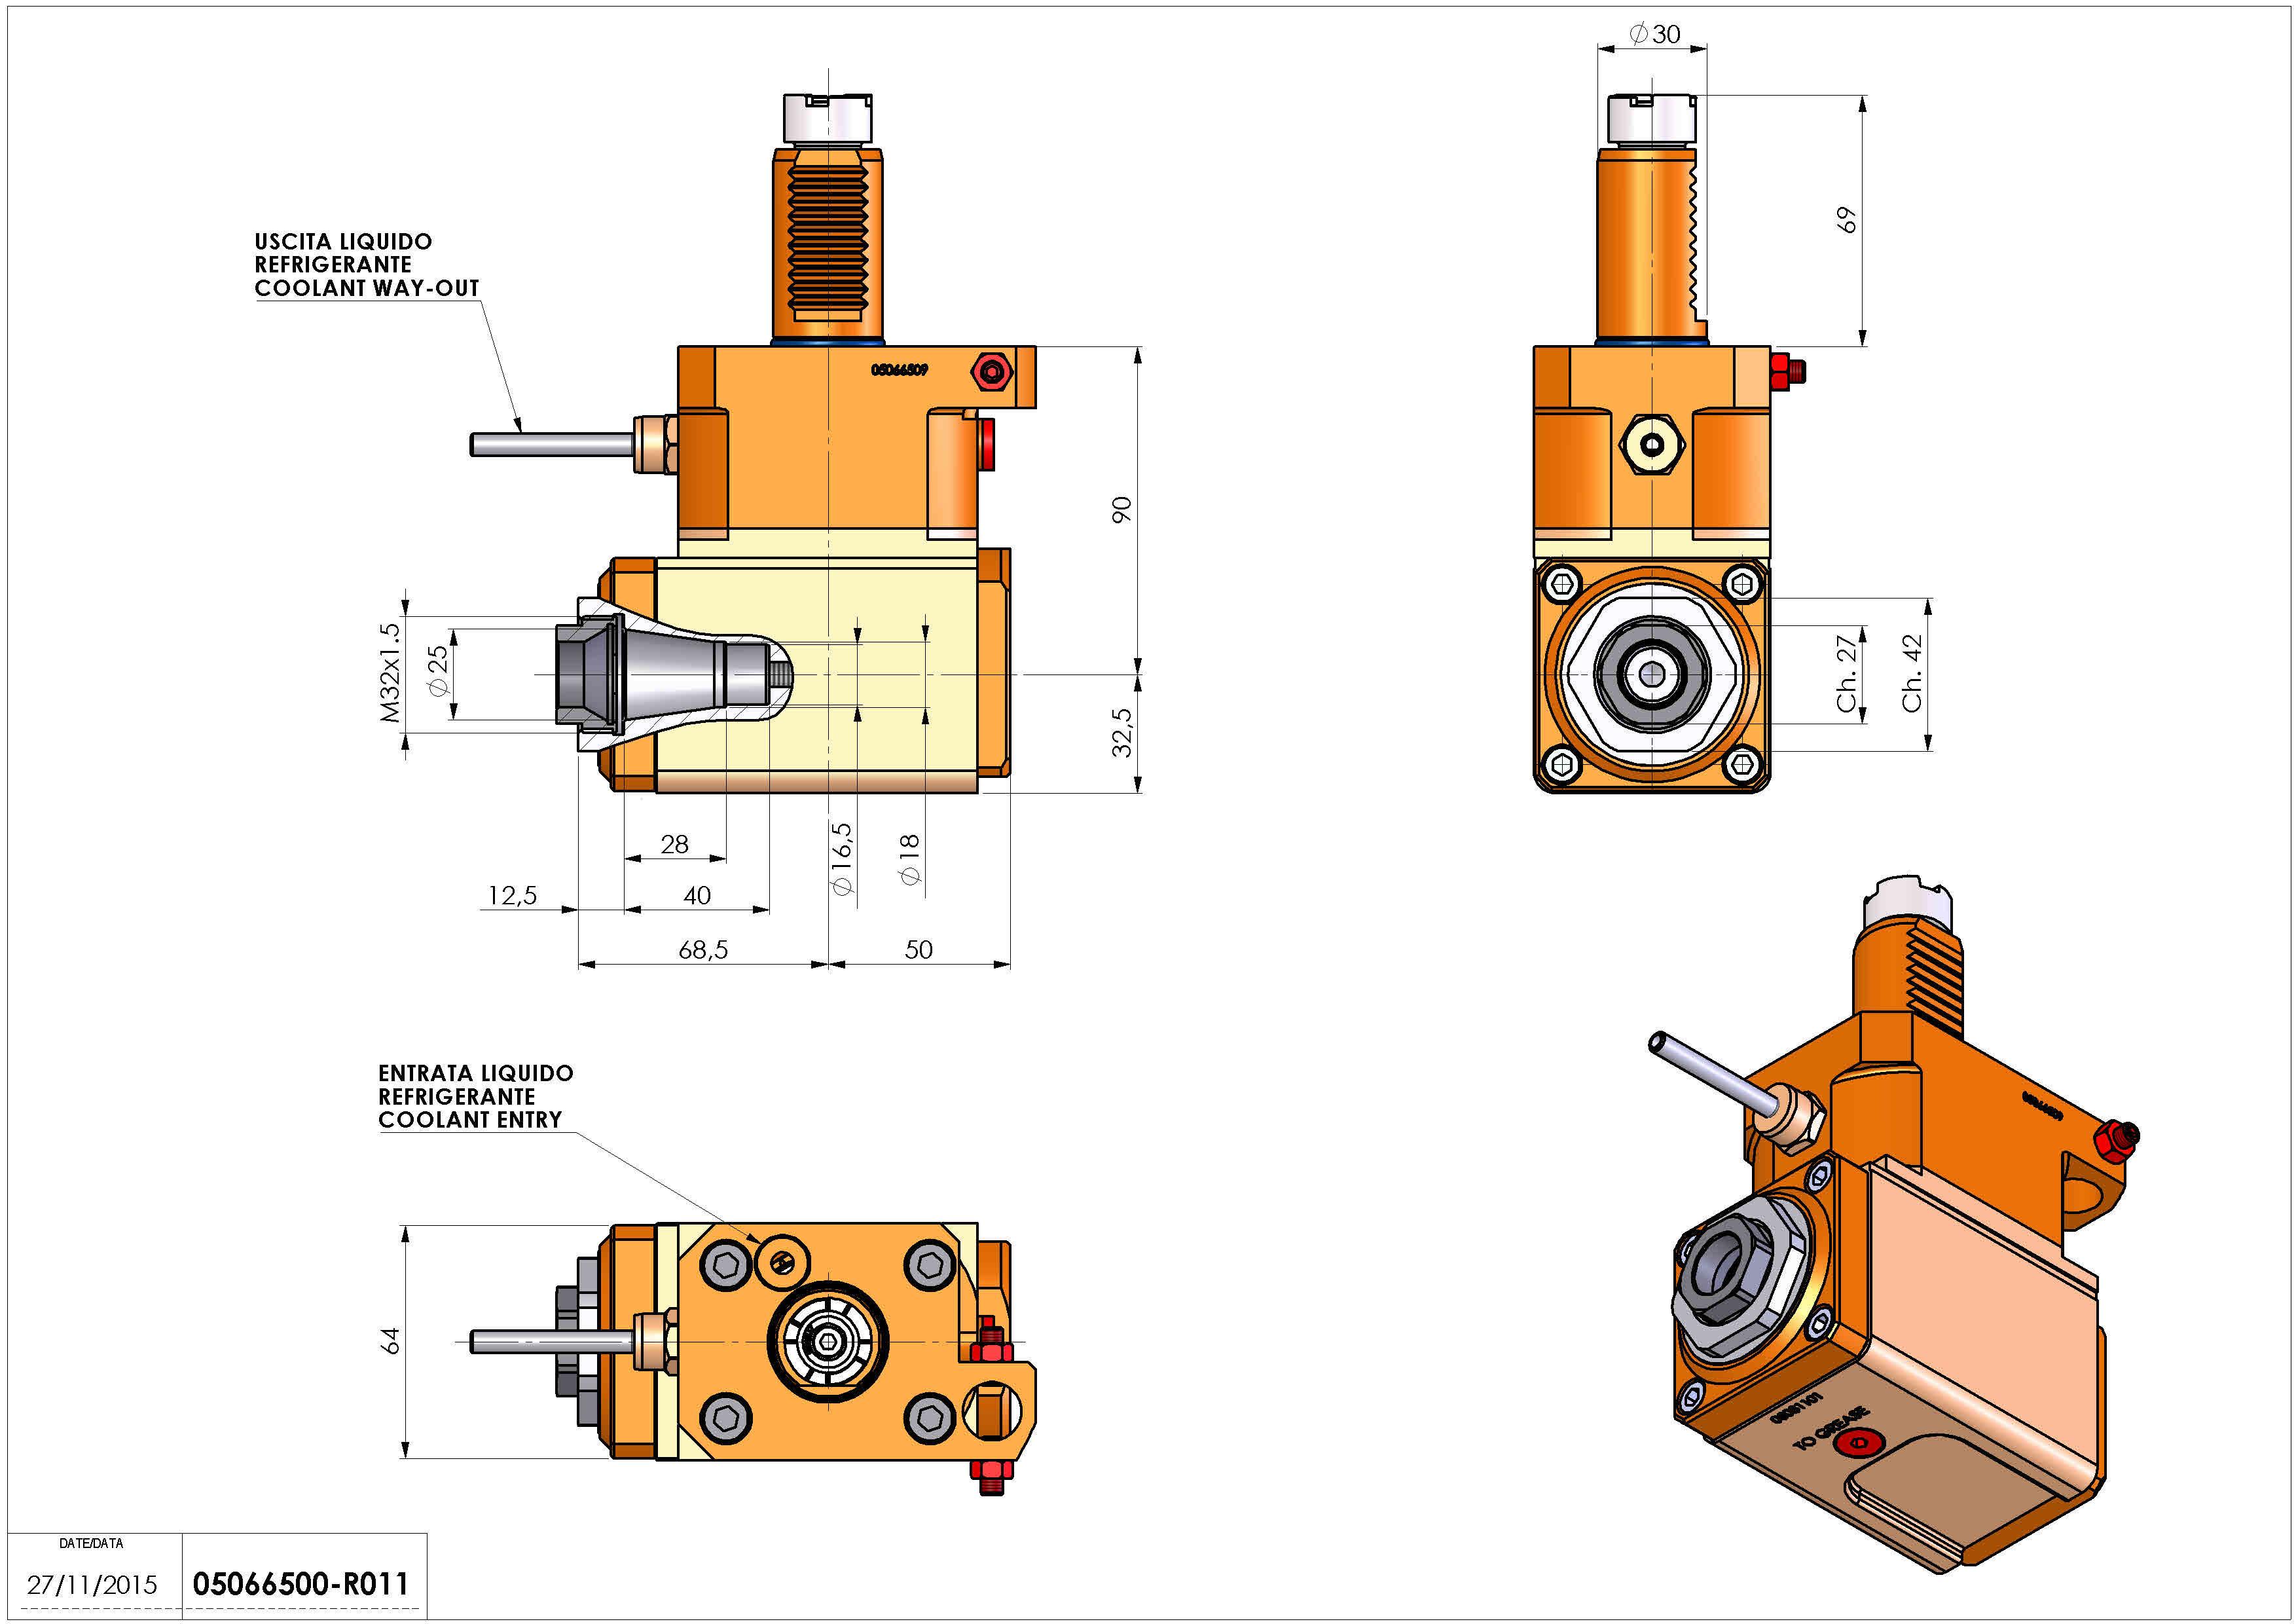 Technical image - LT-A VDI30 ER25F R H90 OK.